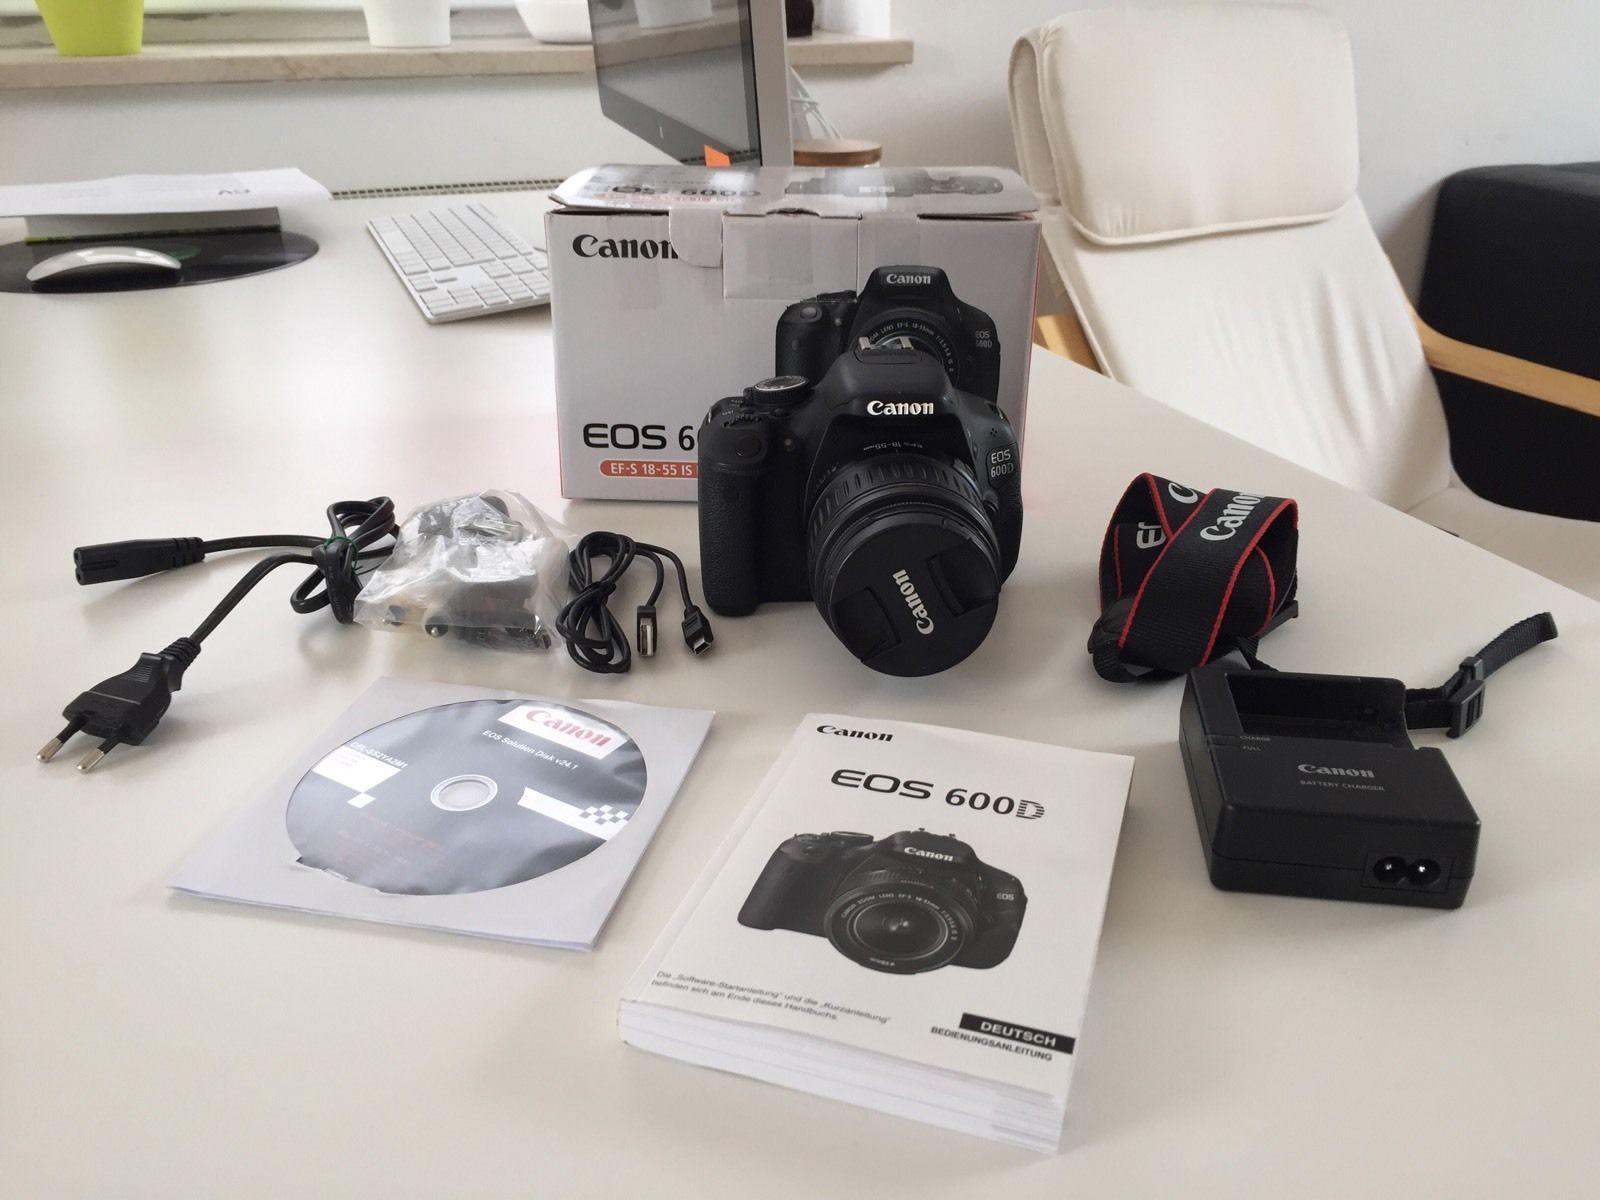 Kelebihan Canon Eos 550d Kit 18 135mm Is Stm Terkini Daftar Harga 800d Paket Kamera 600d 55mm